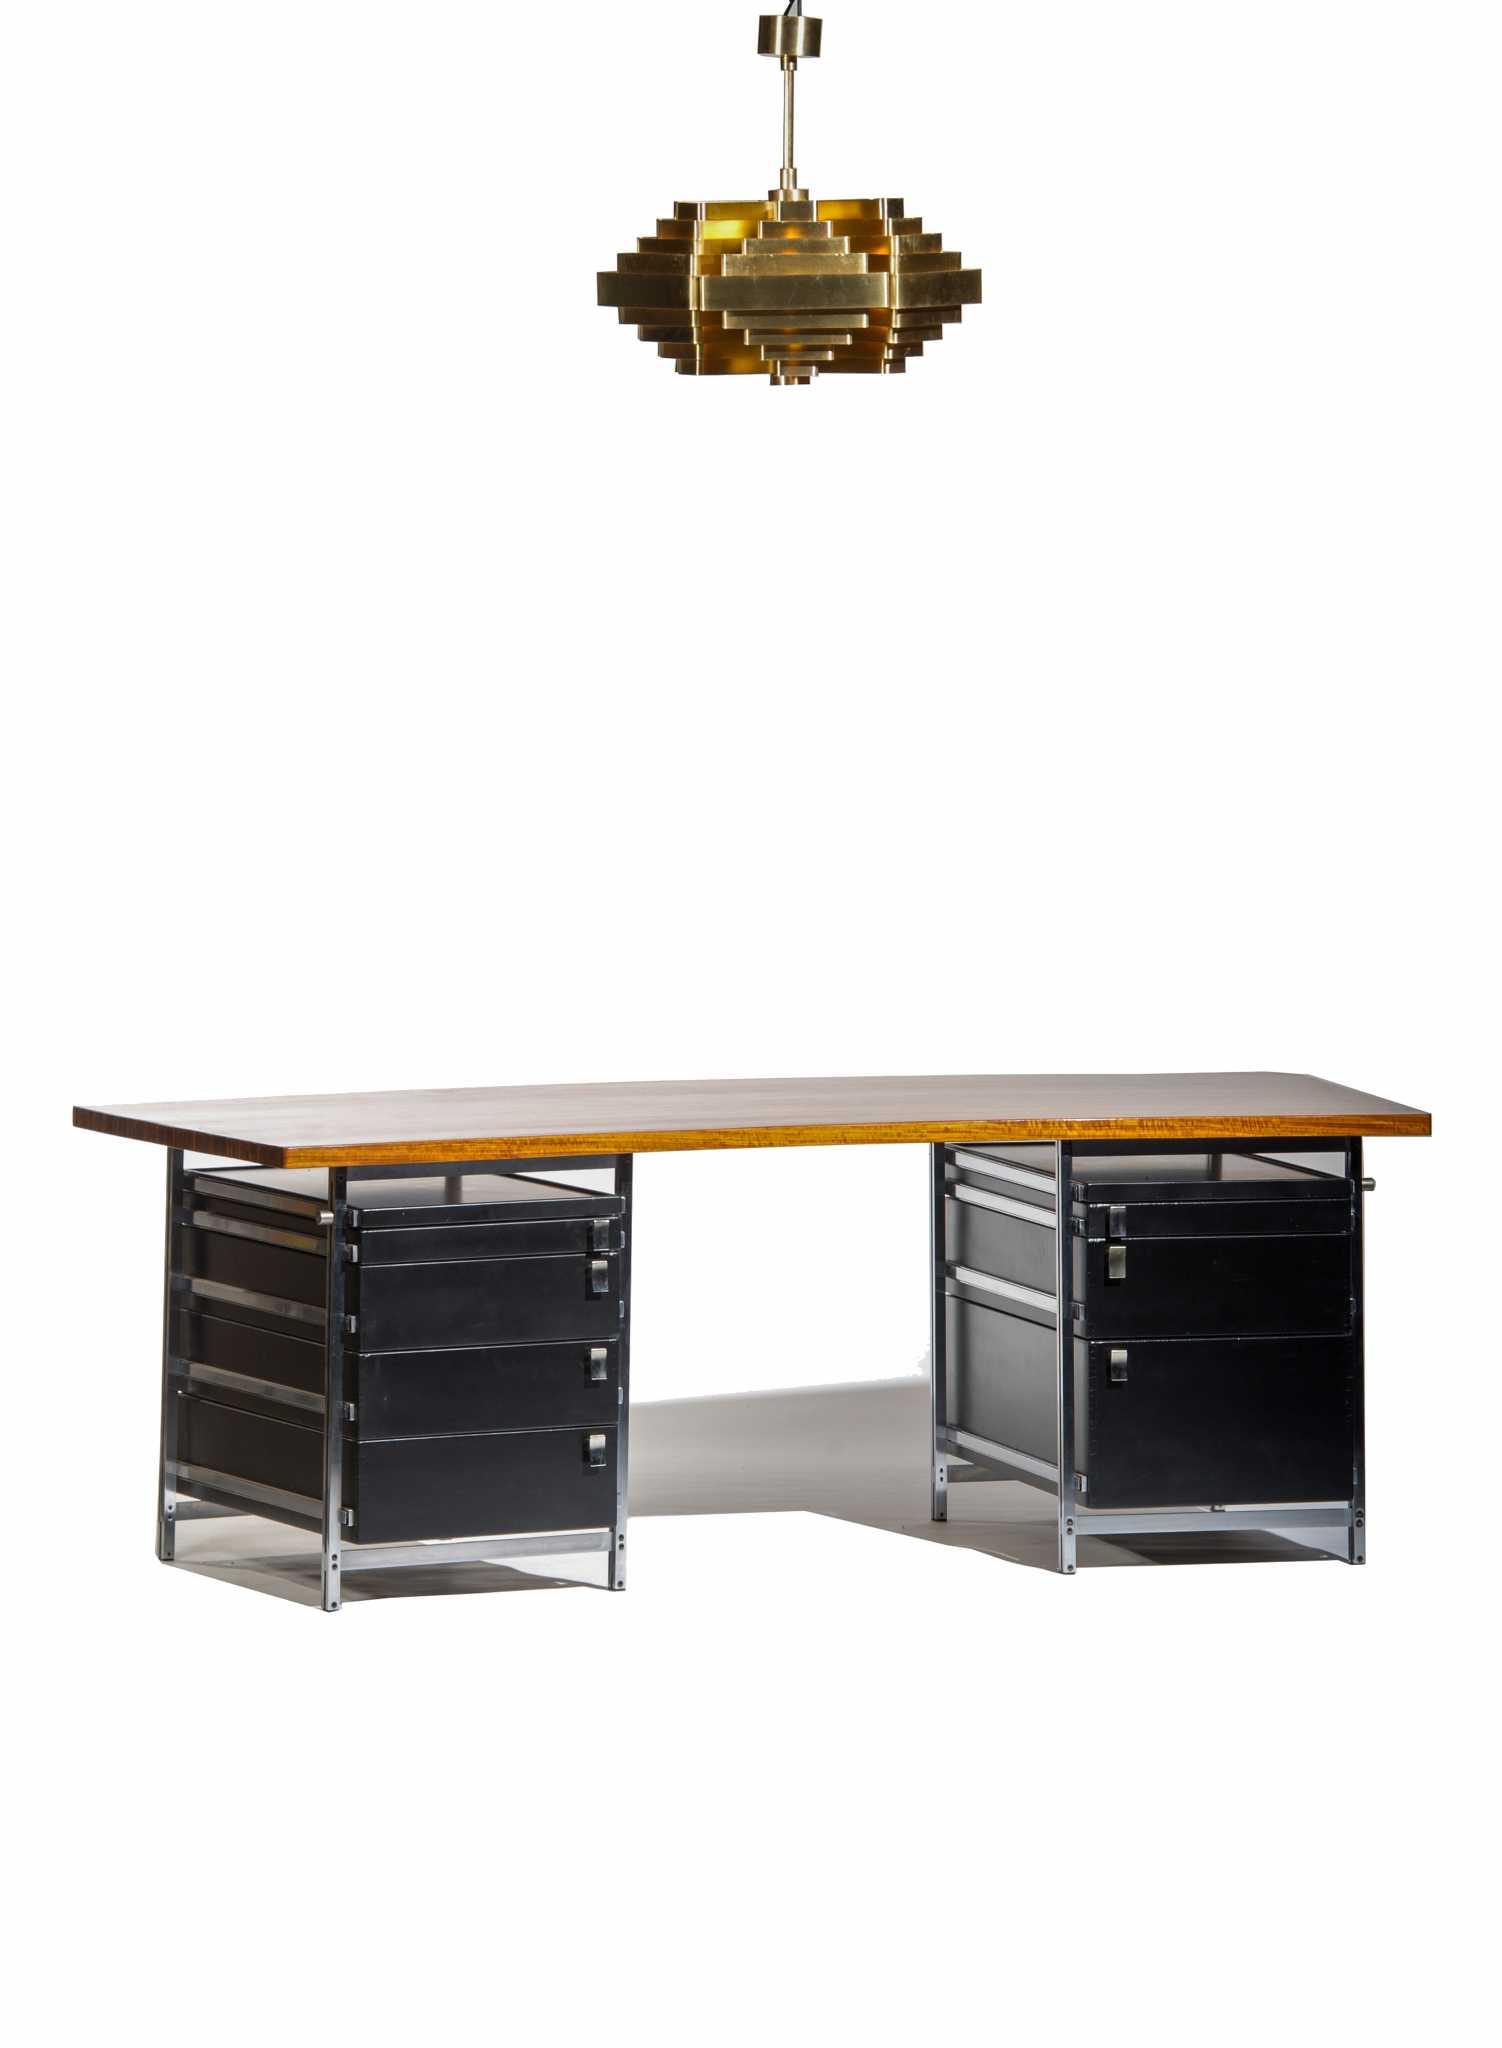 Haesaerts-le Grelle | Antiquite et Restauration